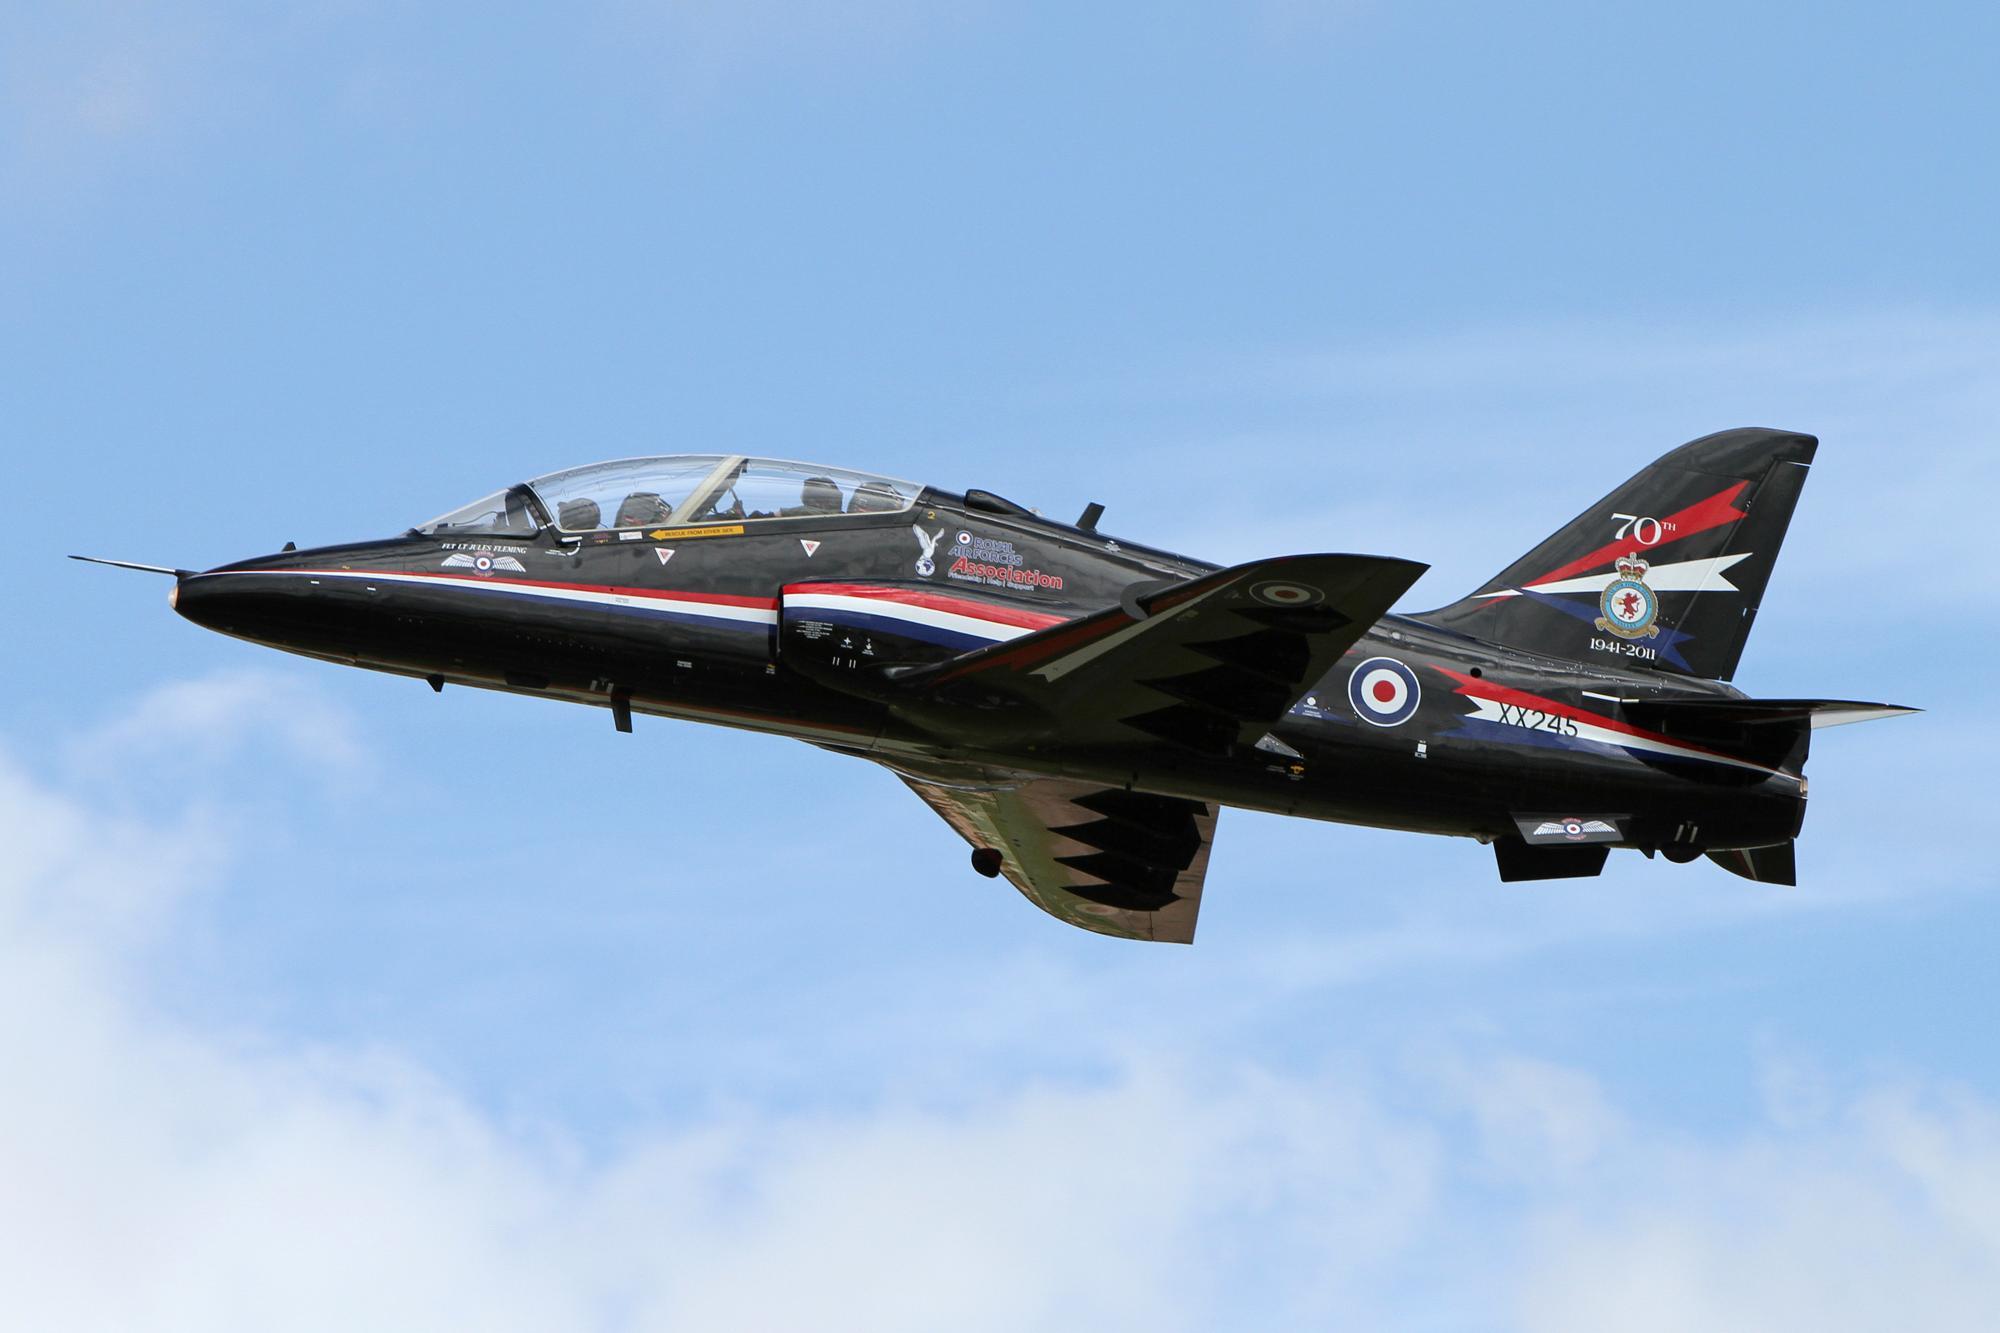 RIAT 2011 RAF Fairford (Pt 1)